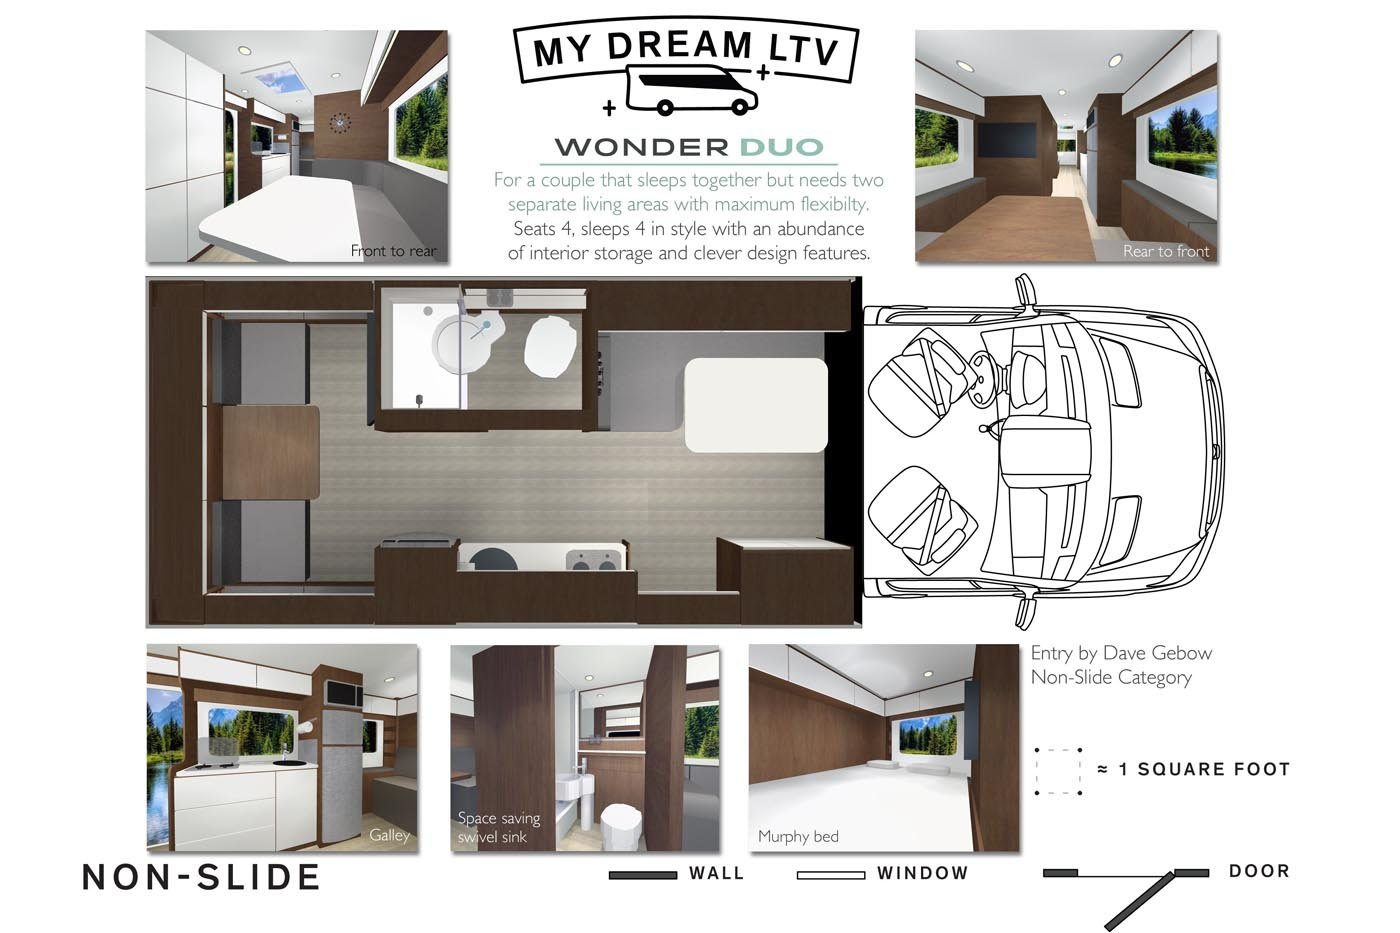 My Dream Ltv Floorplan Contest